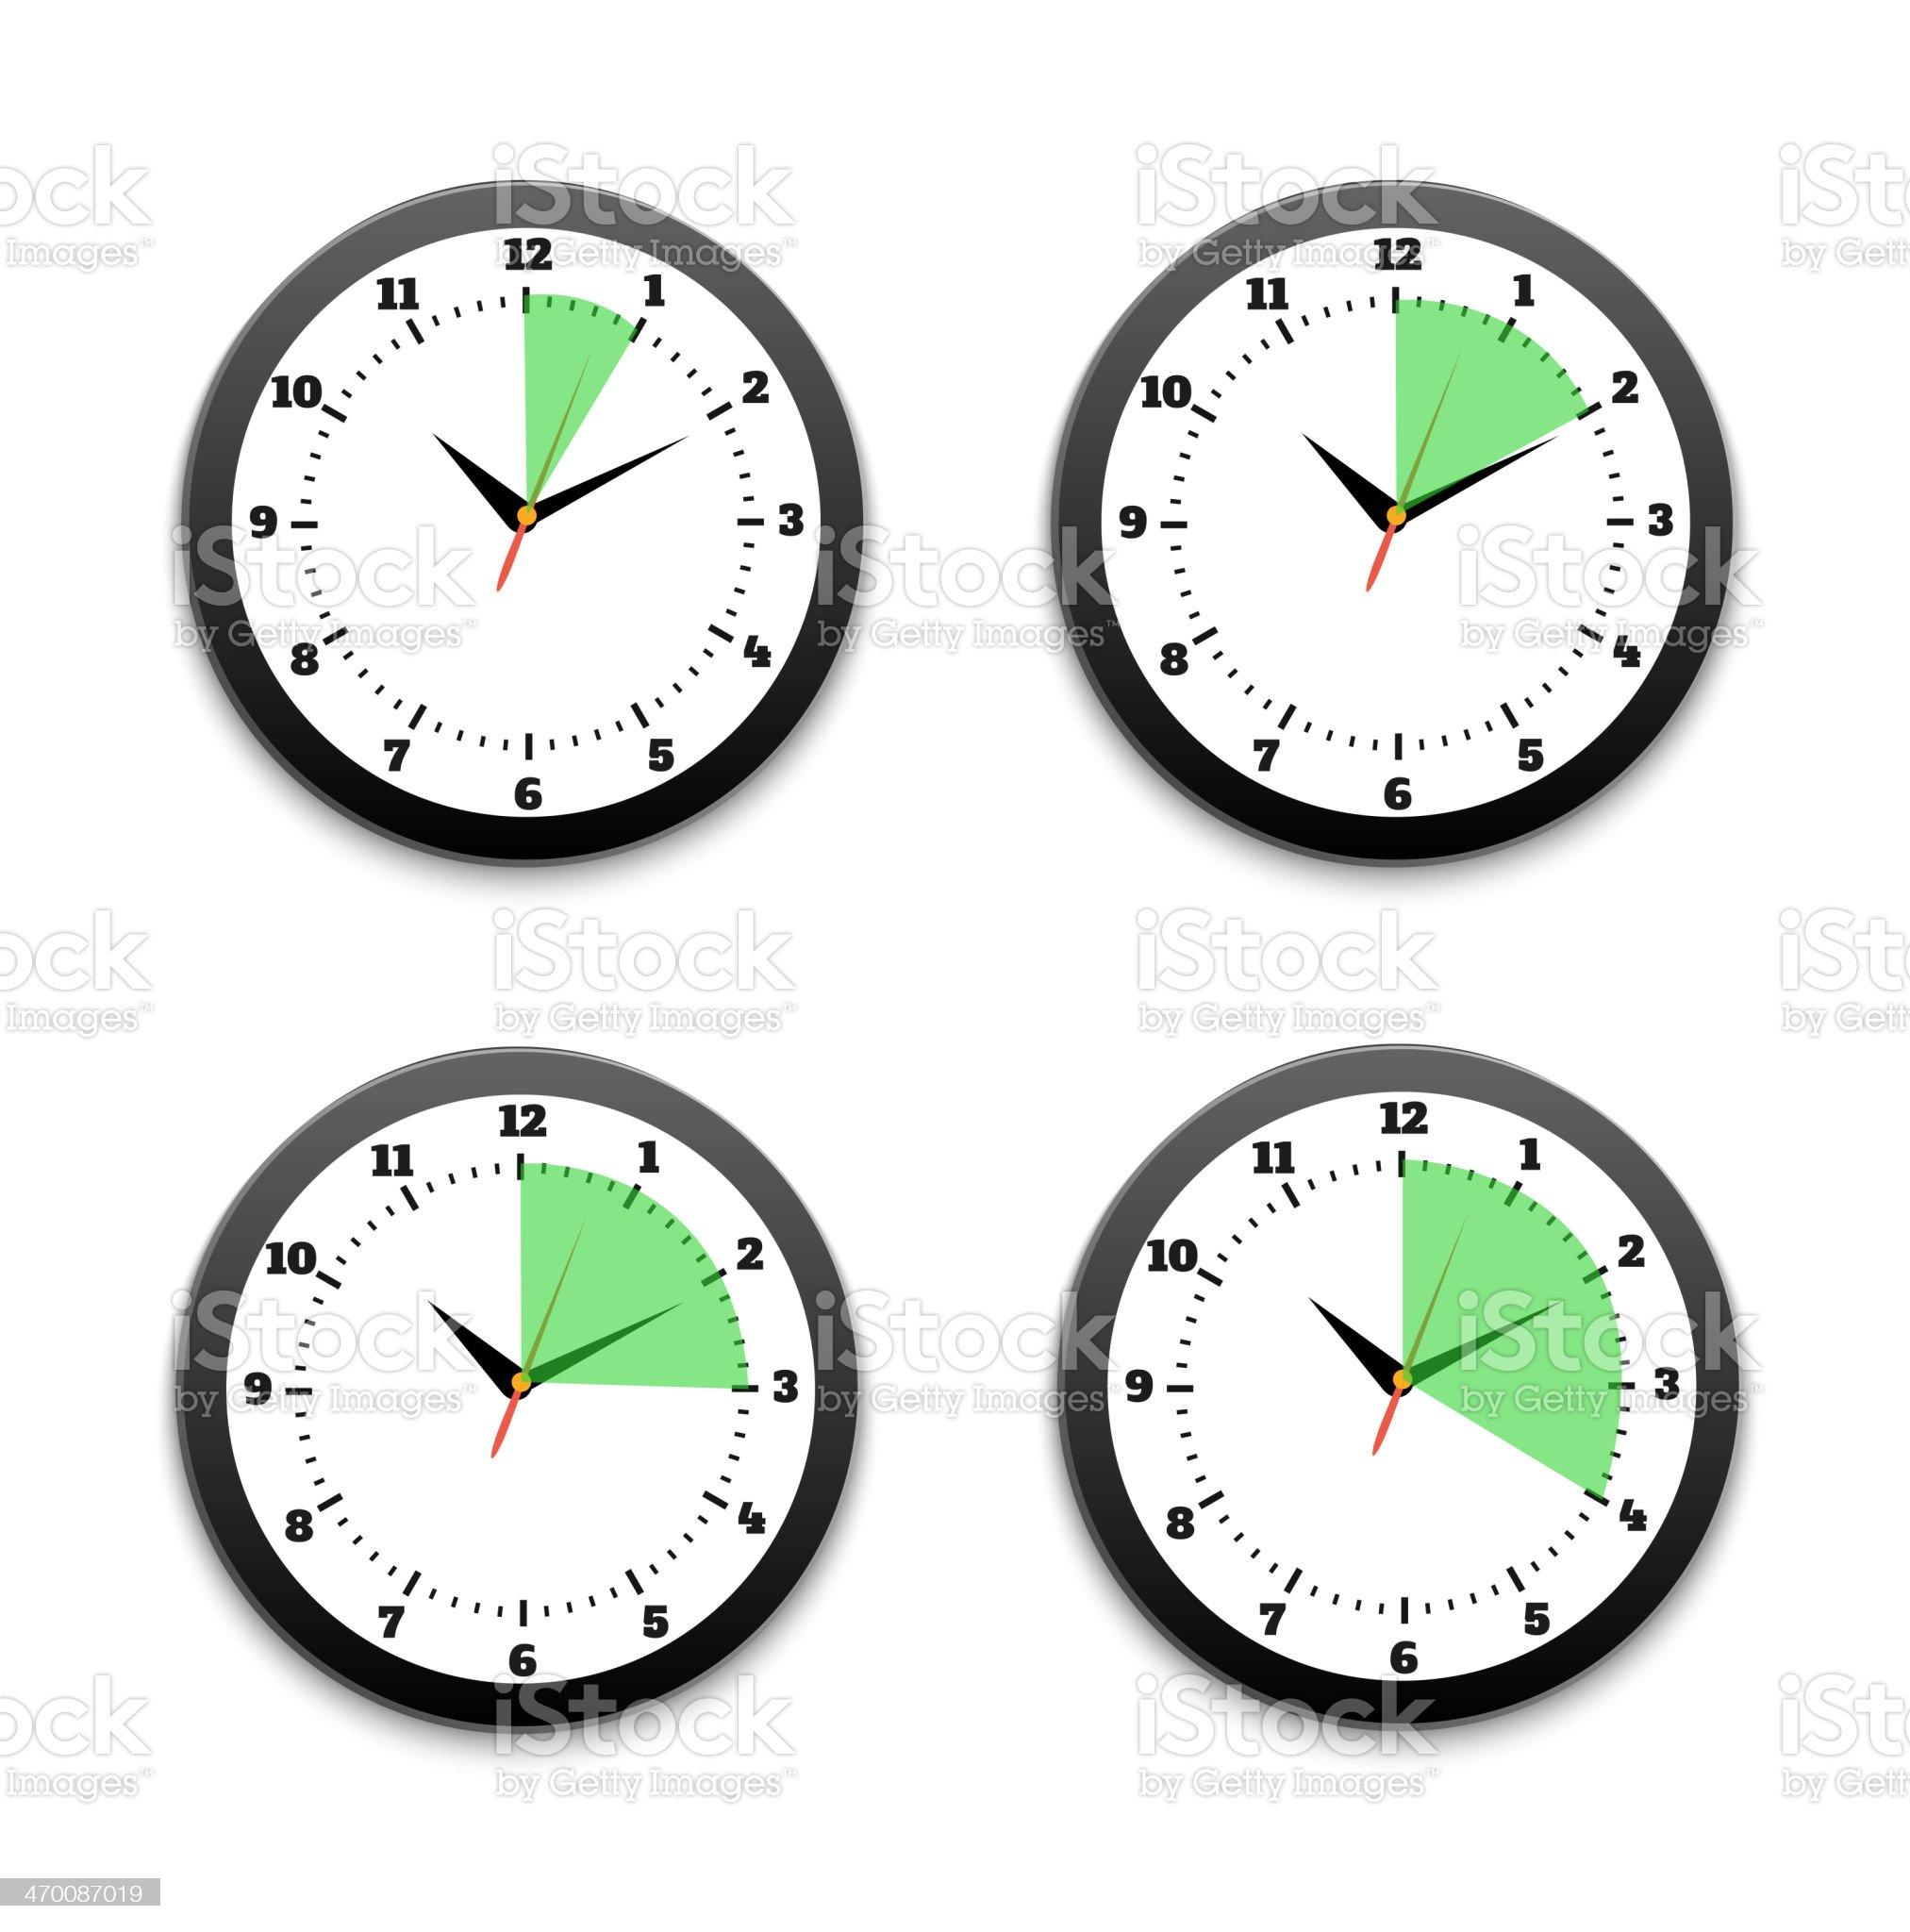 Black clocks icon royalty-free stock vector art